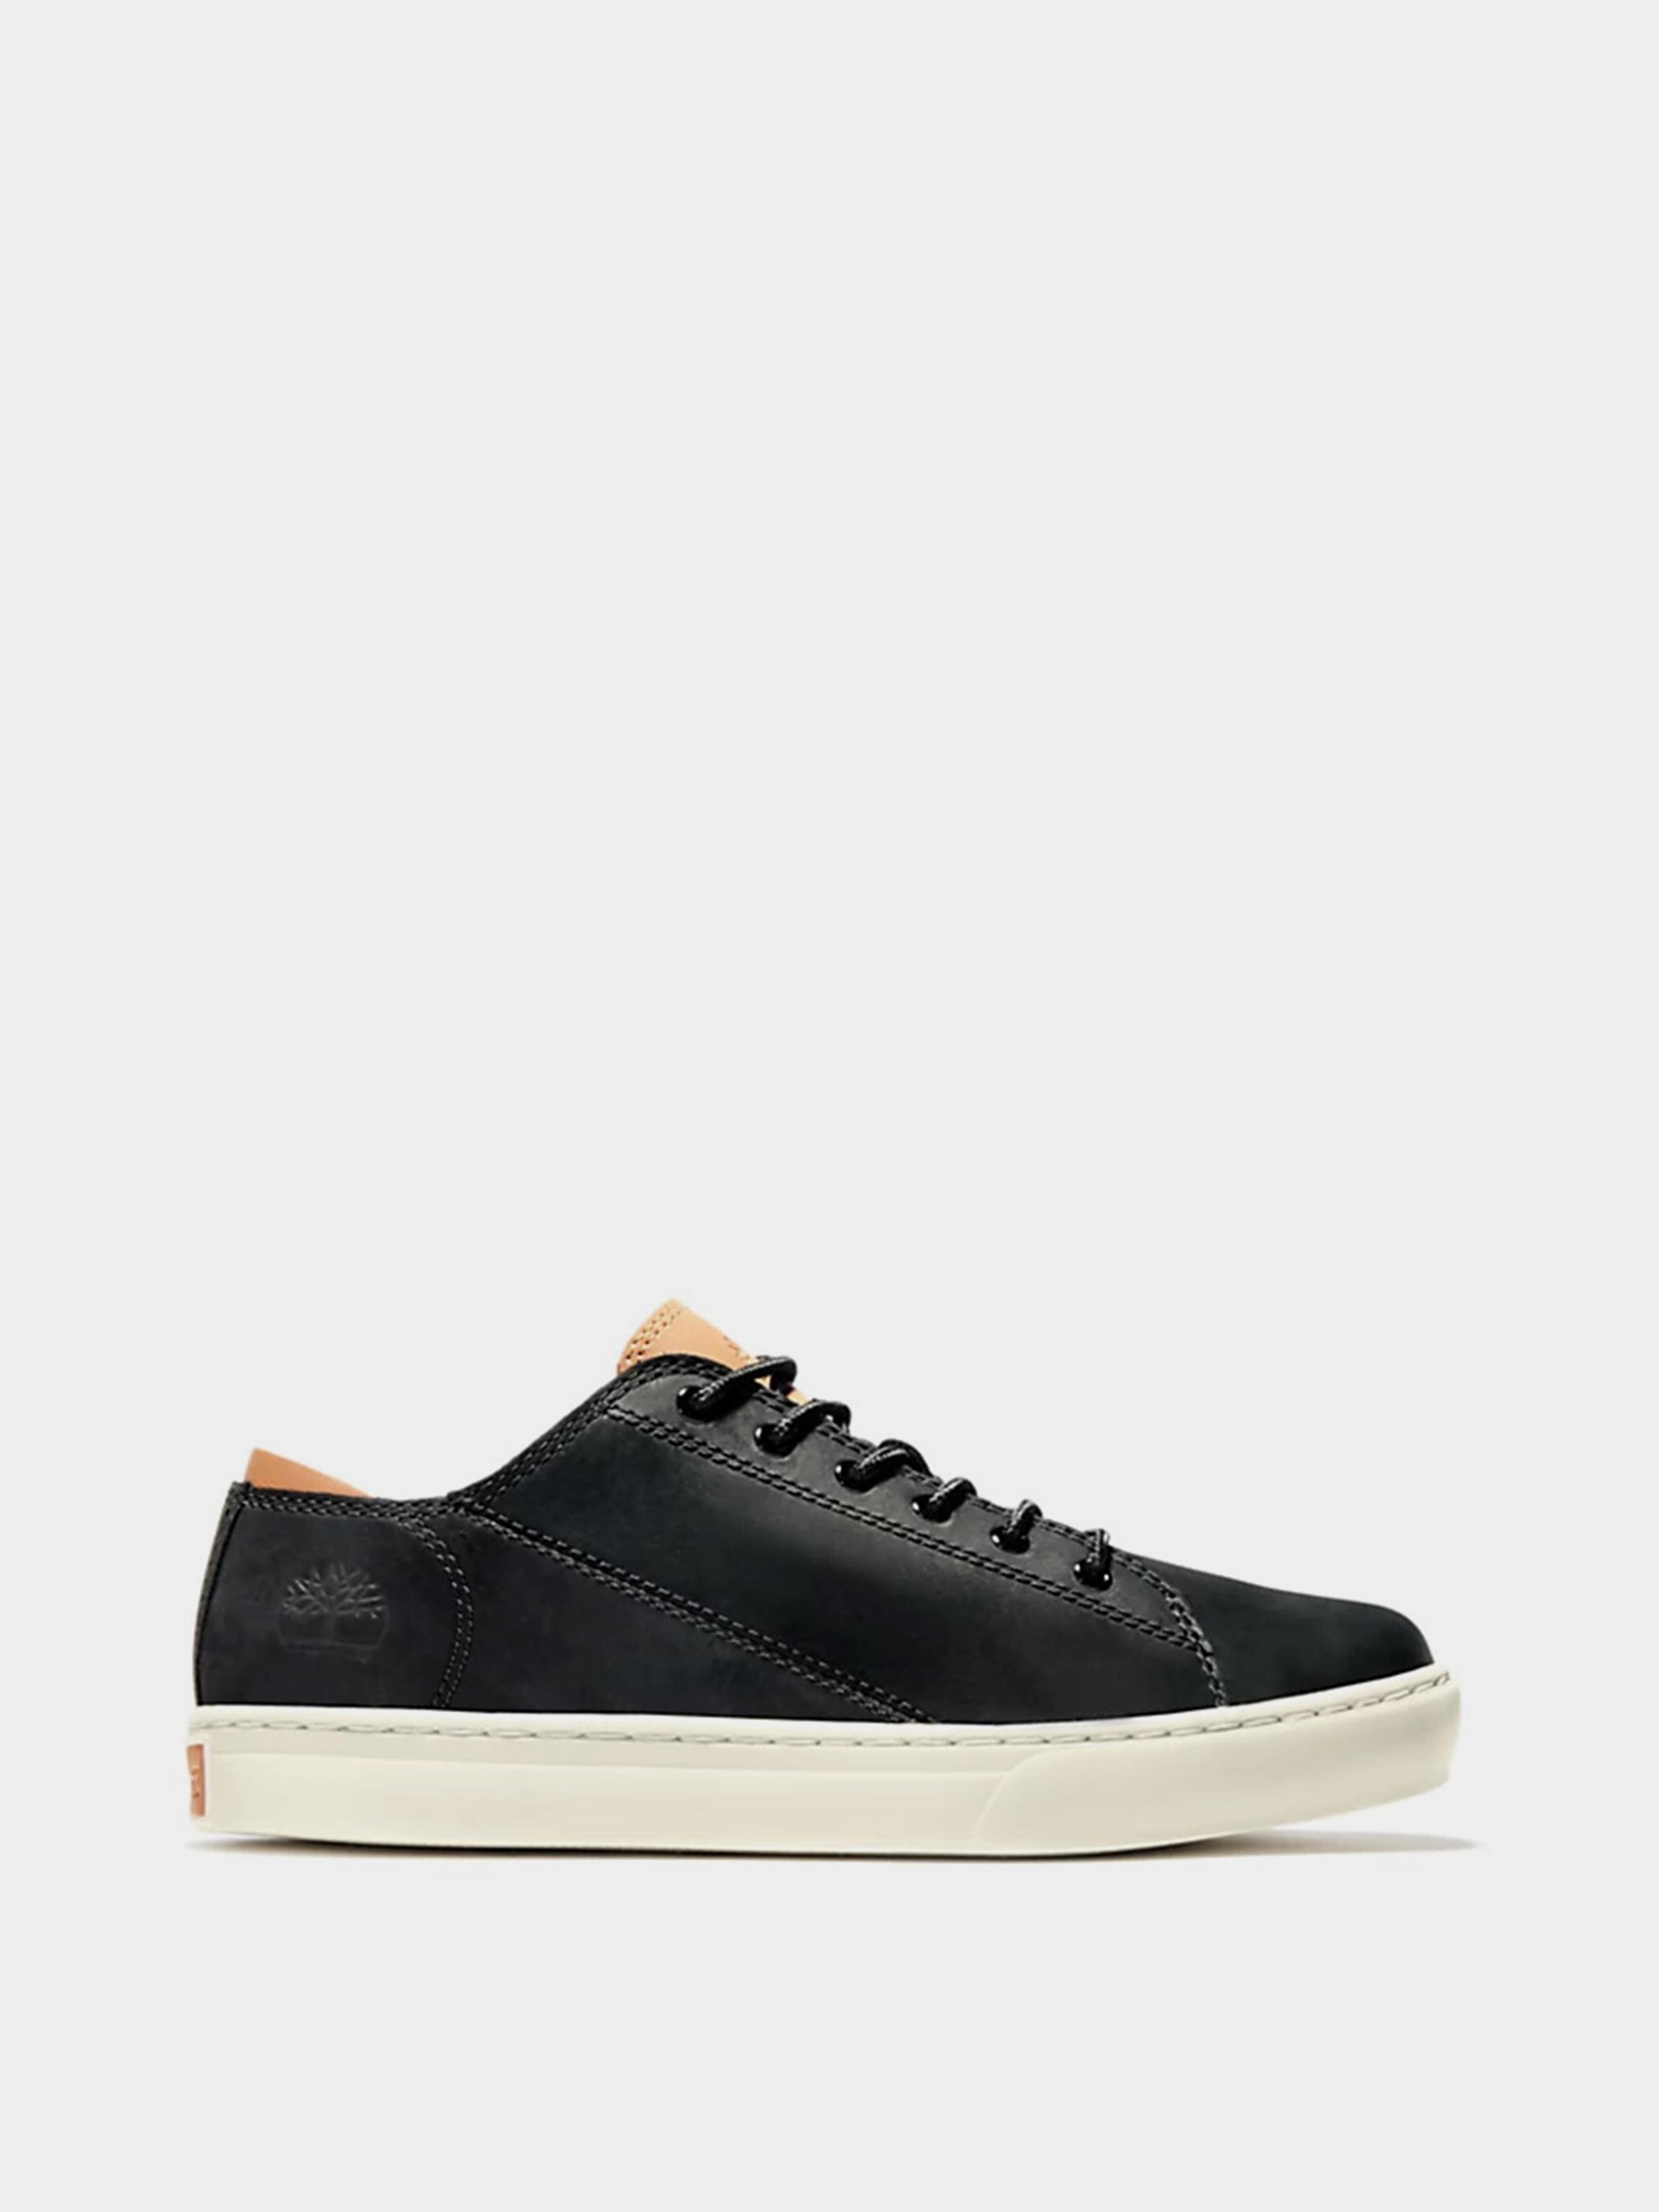 Полуботинки для мужчин Timberland Adventure 2.0 TF3902 брендовая обувь, 2017